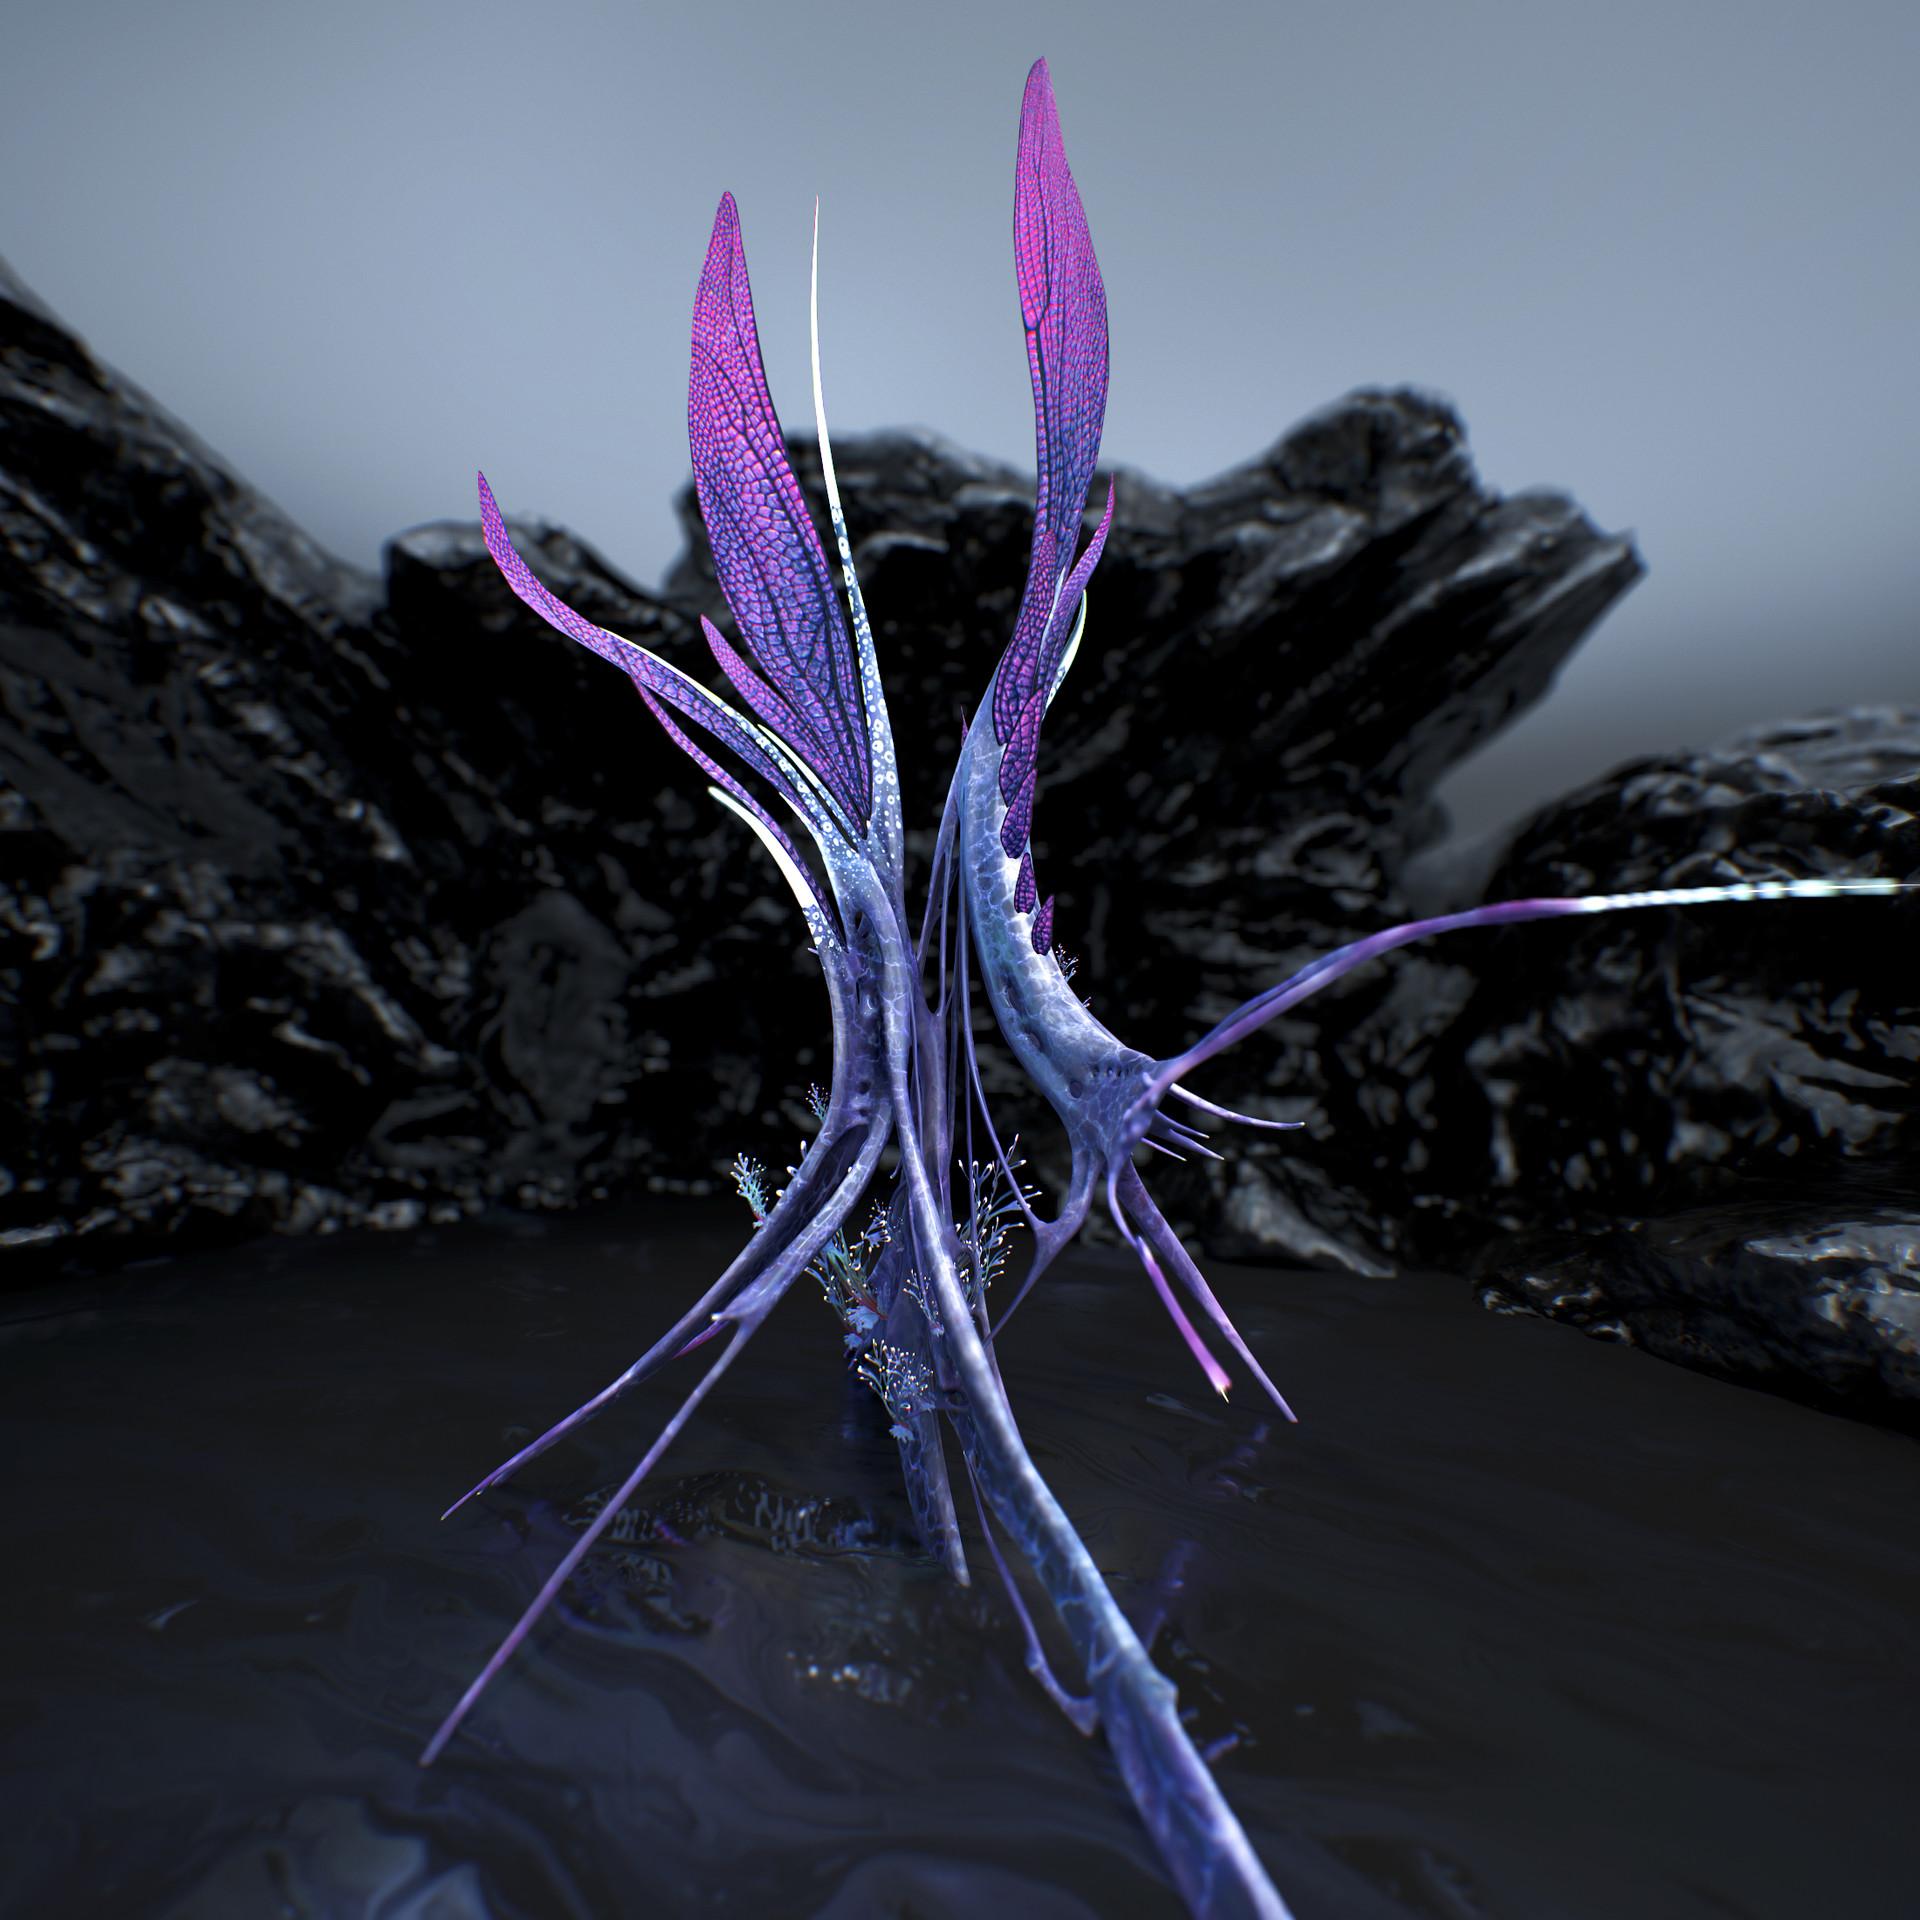 Johan de leenheer alien fern misota spletinus51